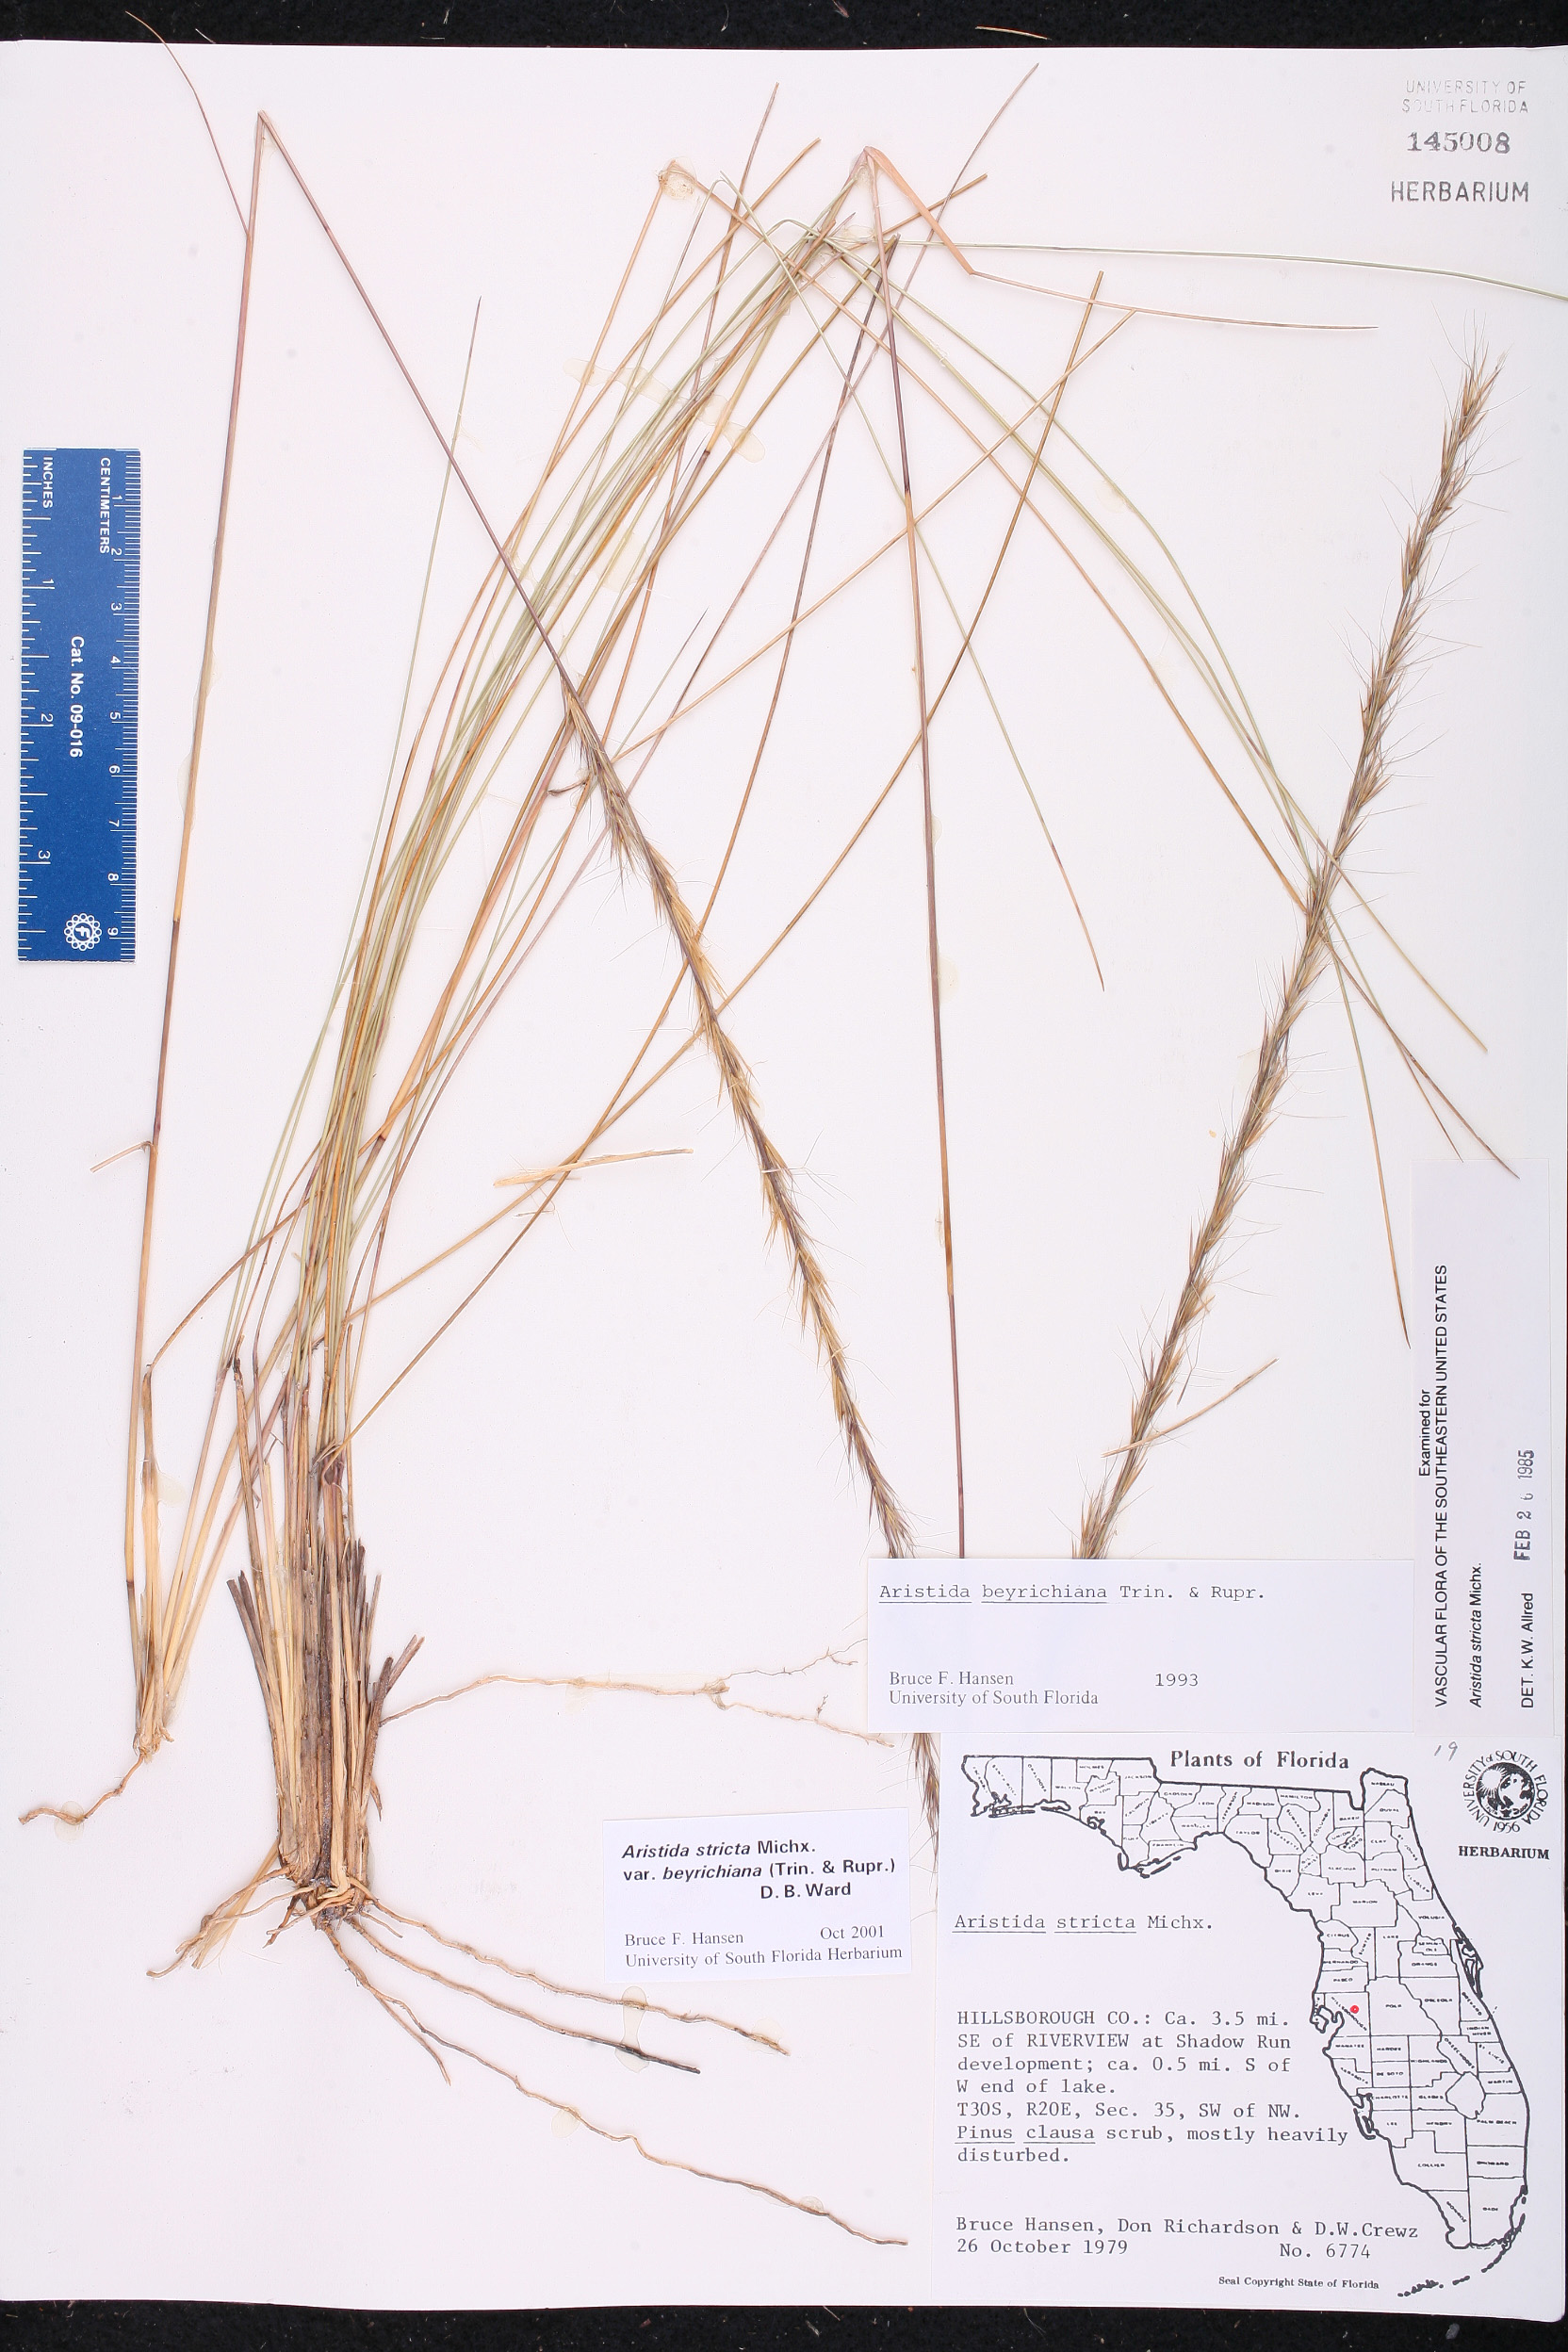 aristida stricta species page isb atlas of florida plants